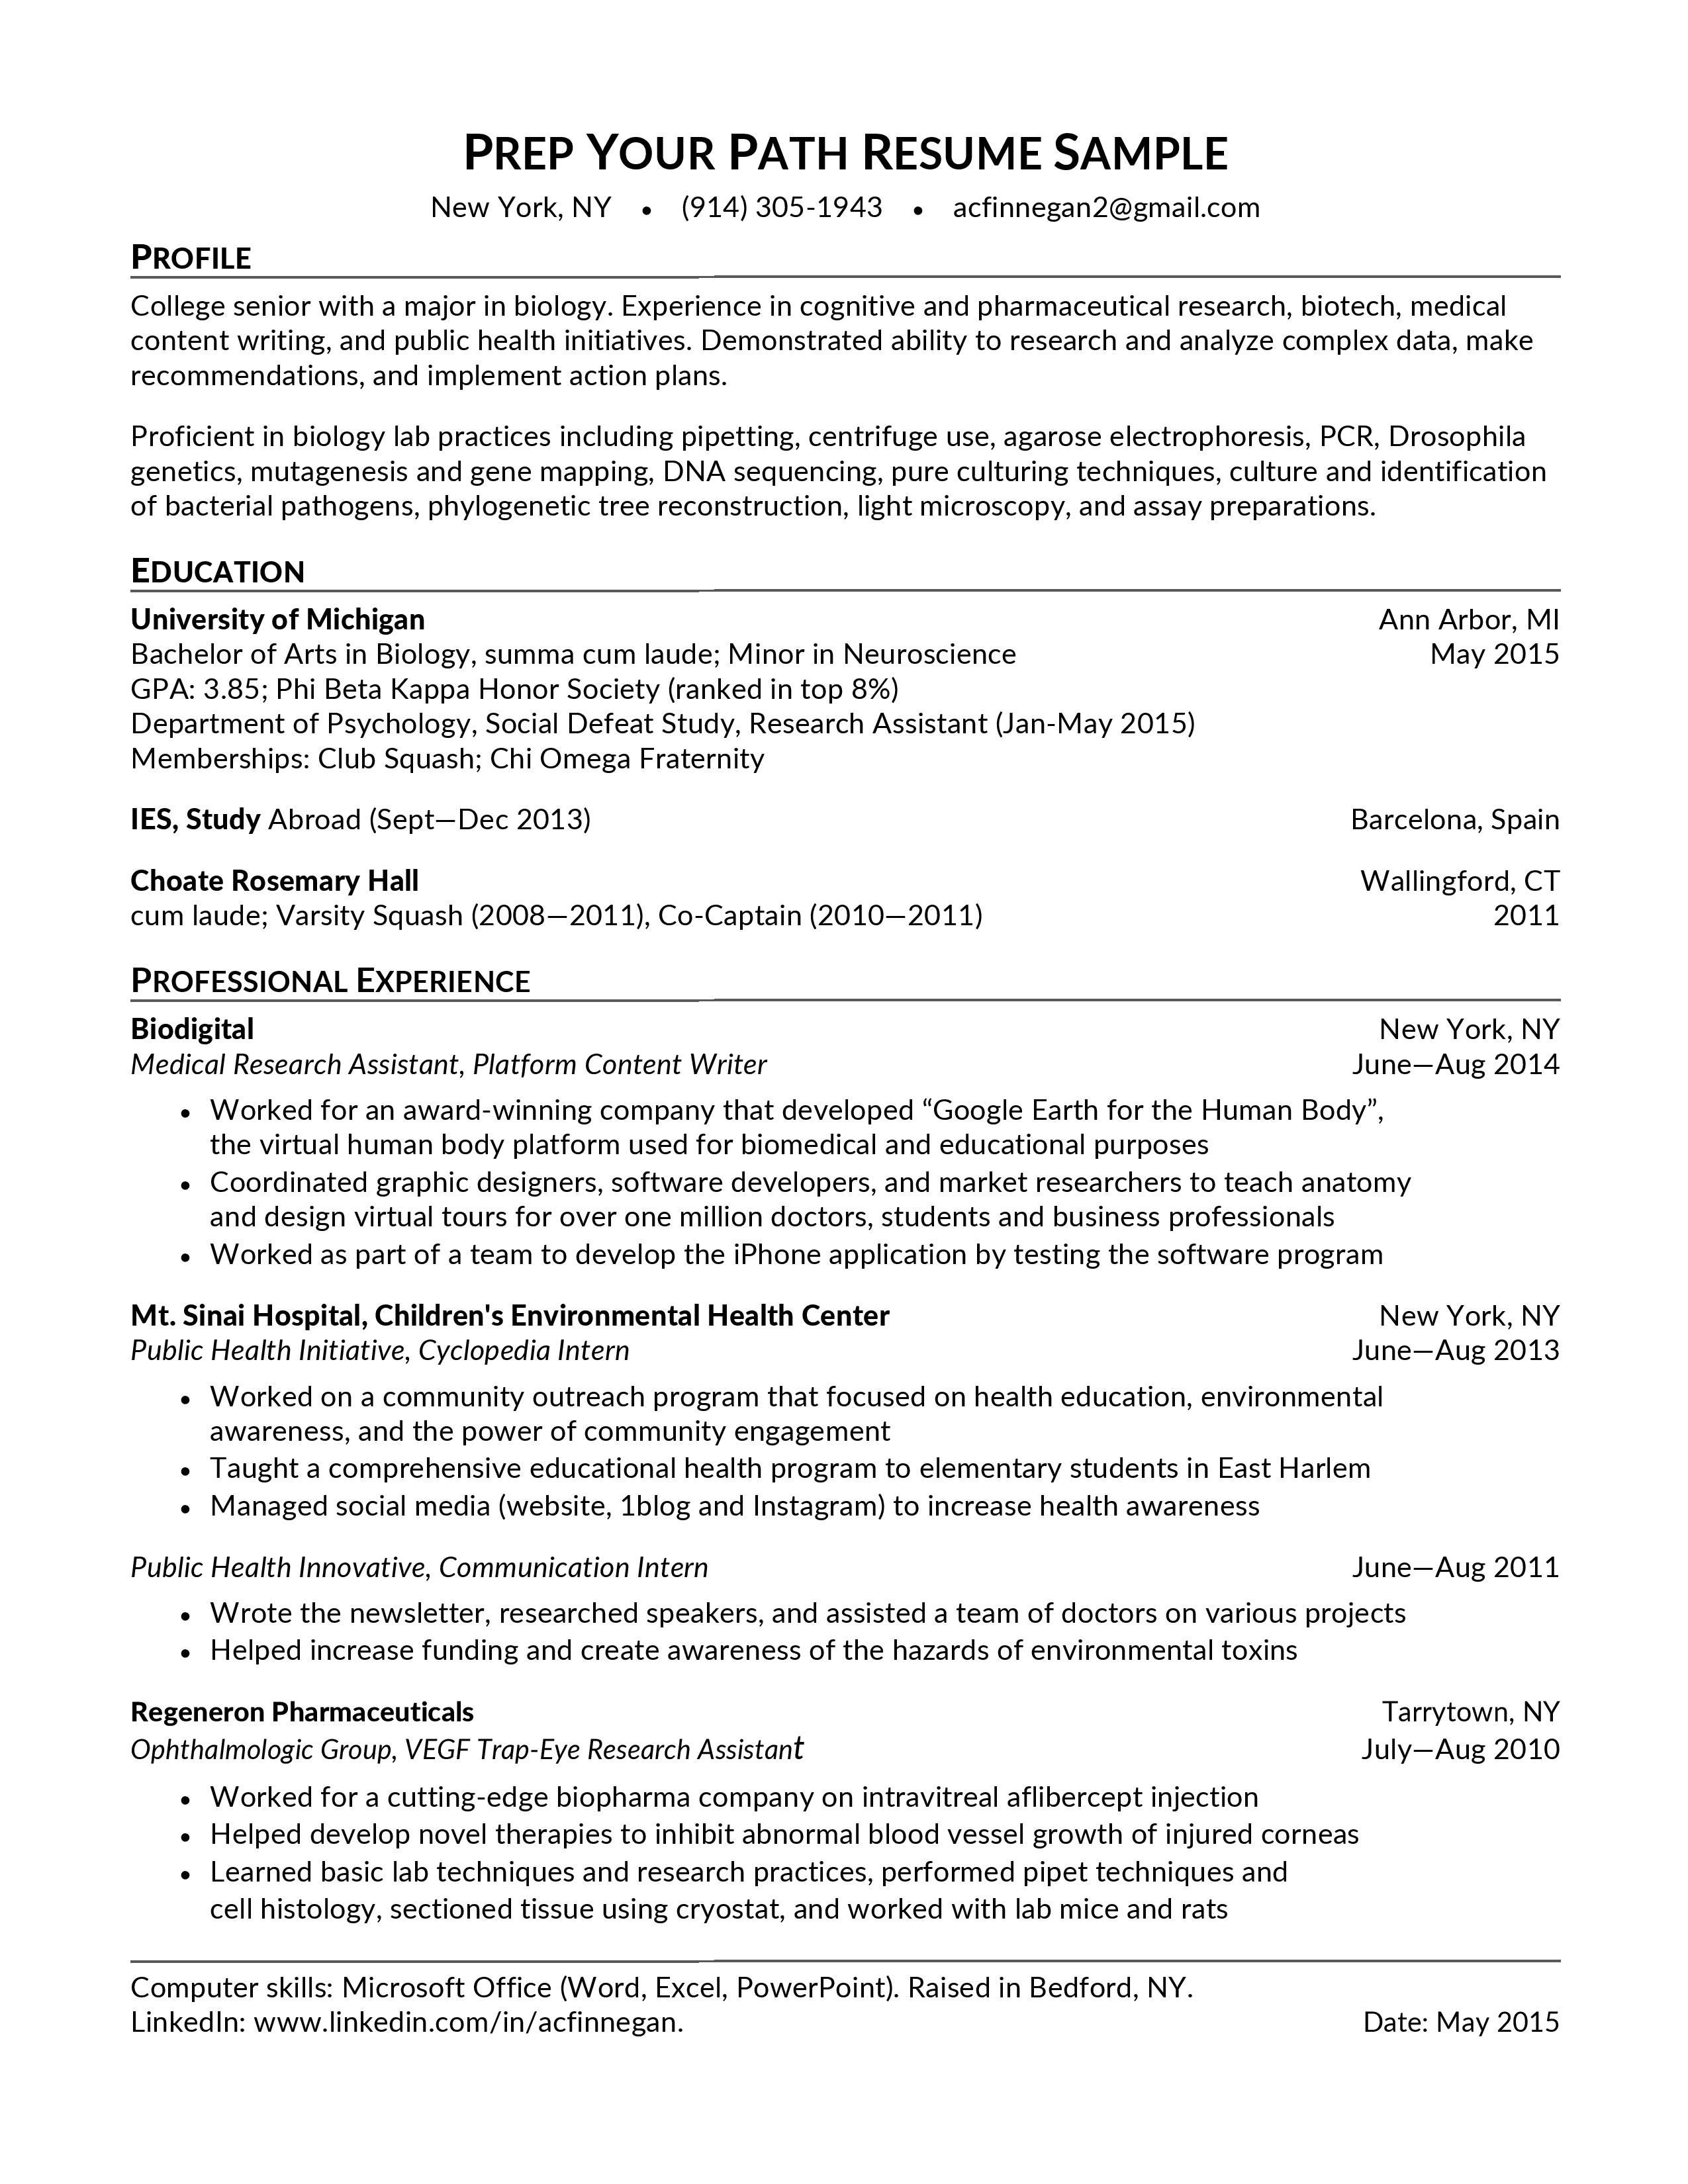 Recent Grad Resume After